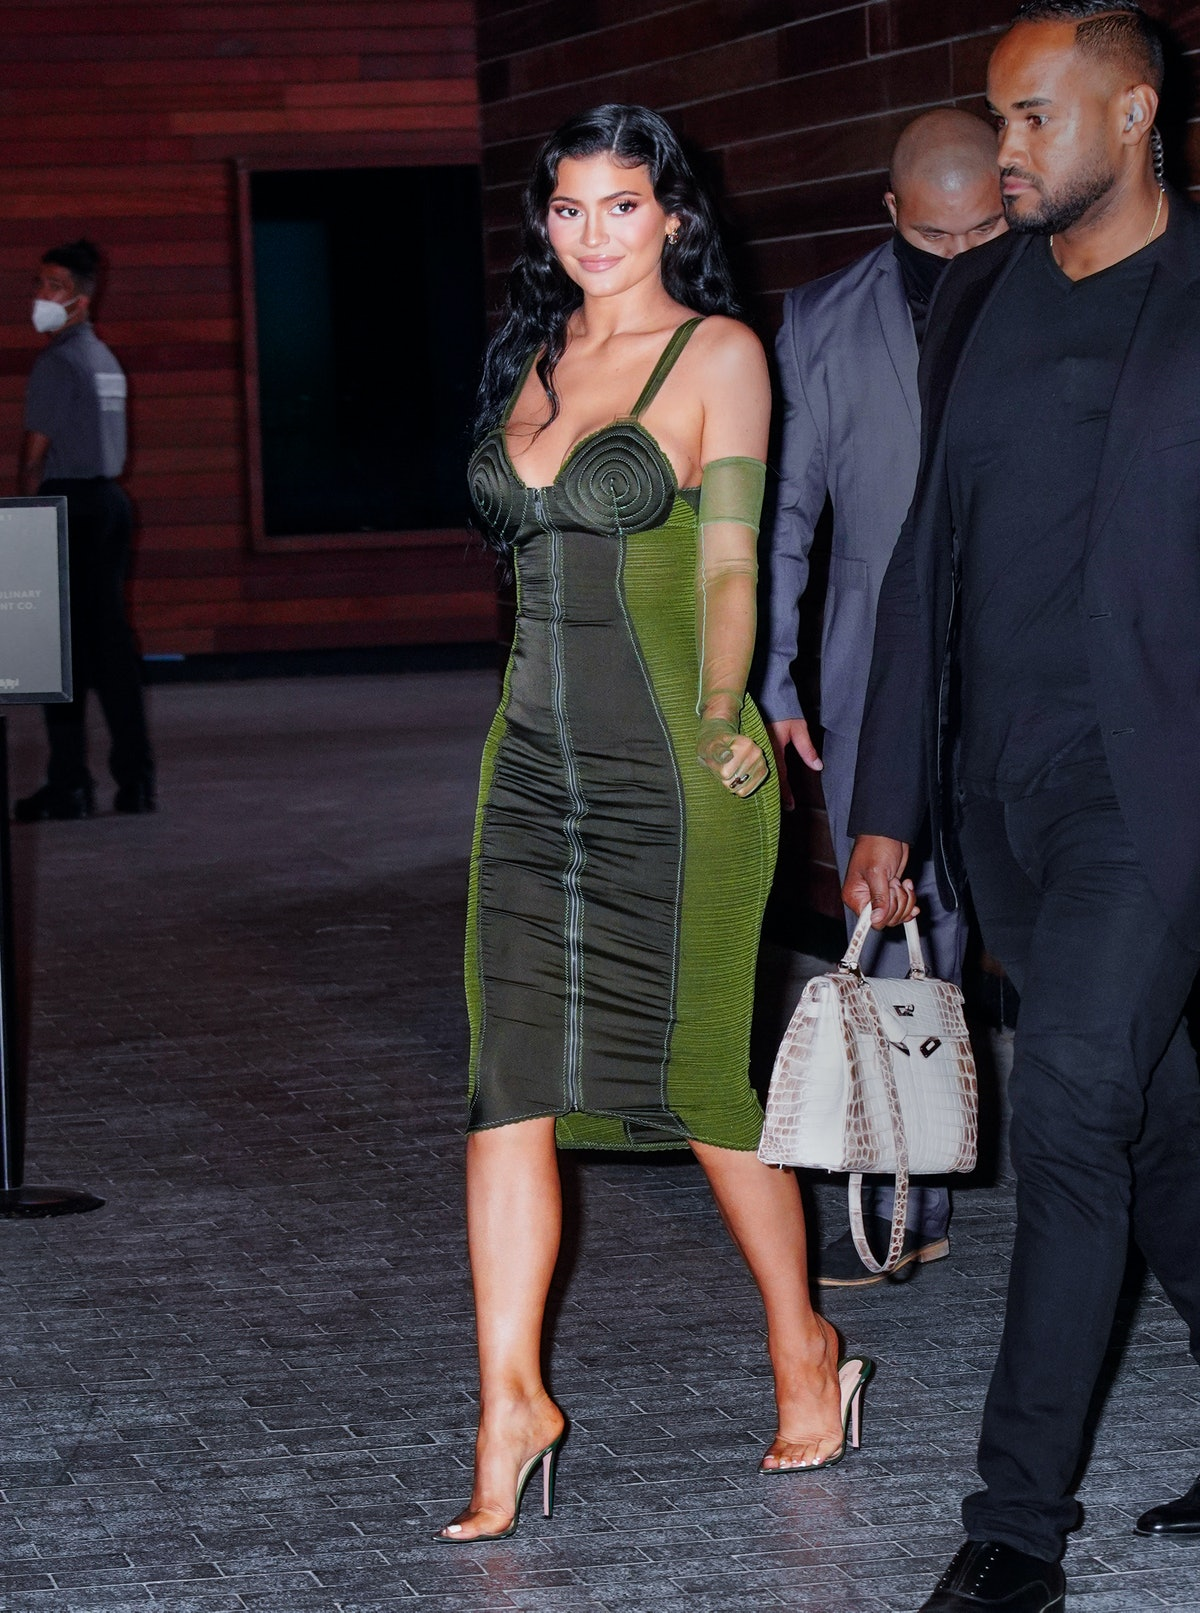 Kylie Jenner in green Gaultier.